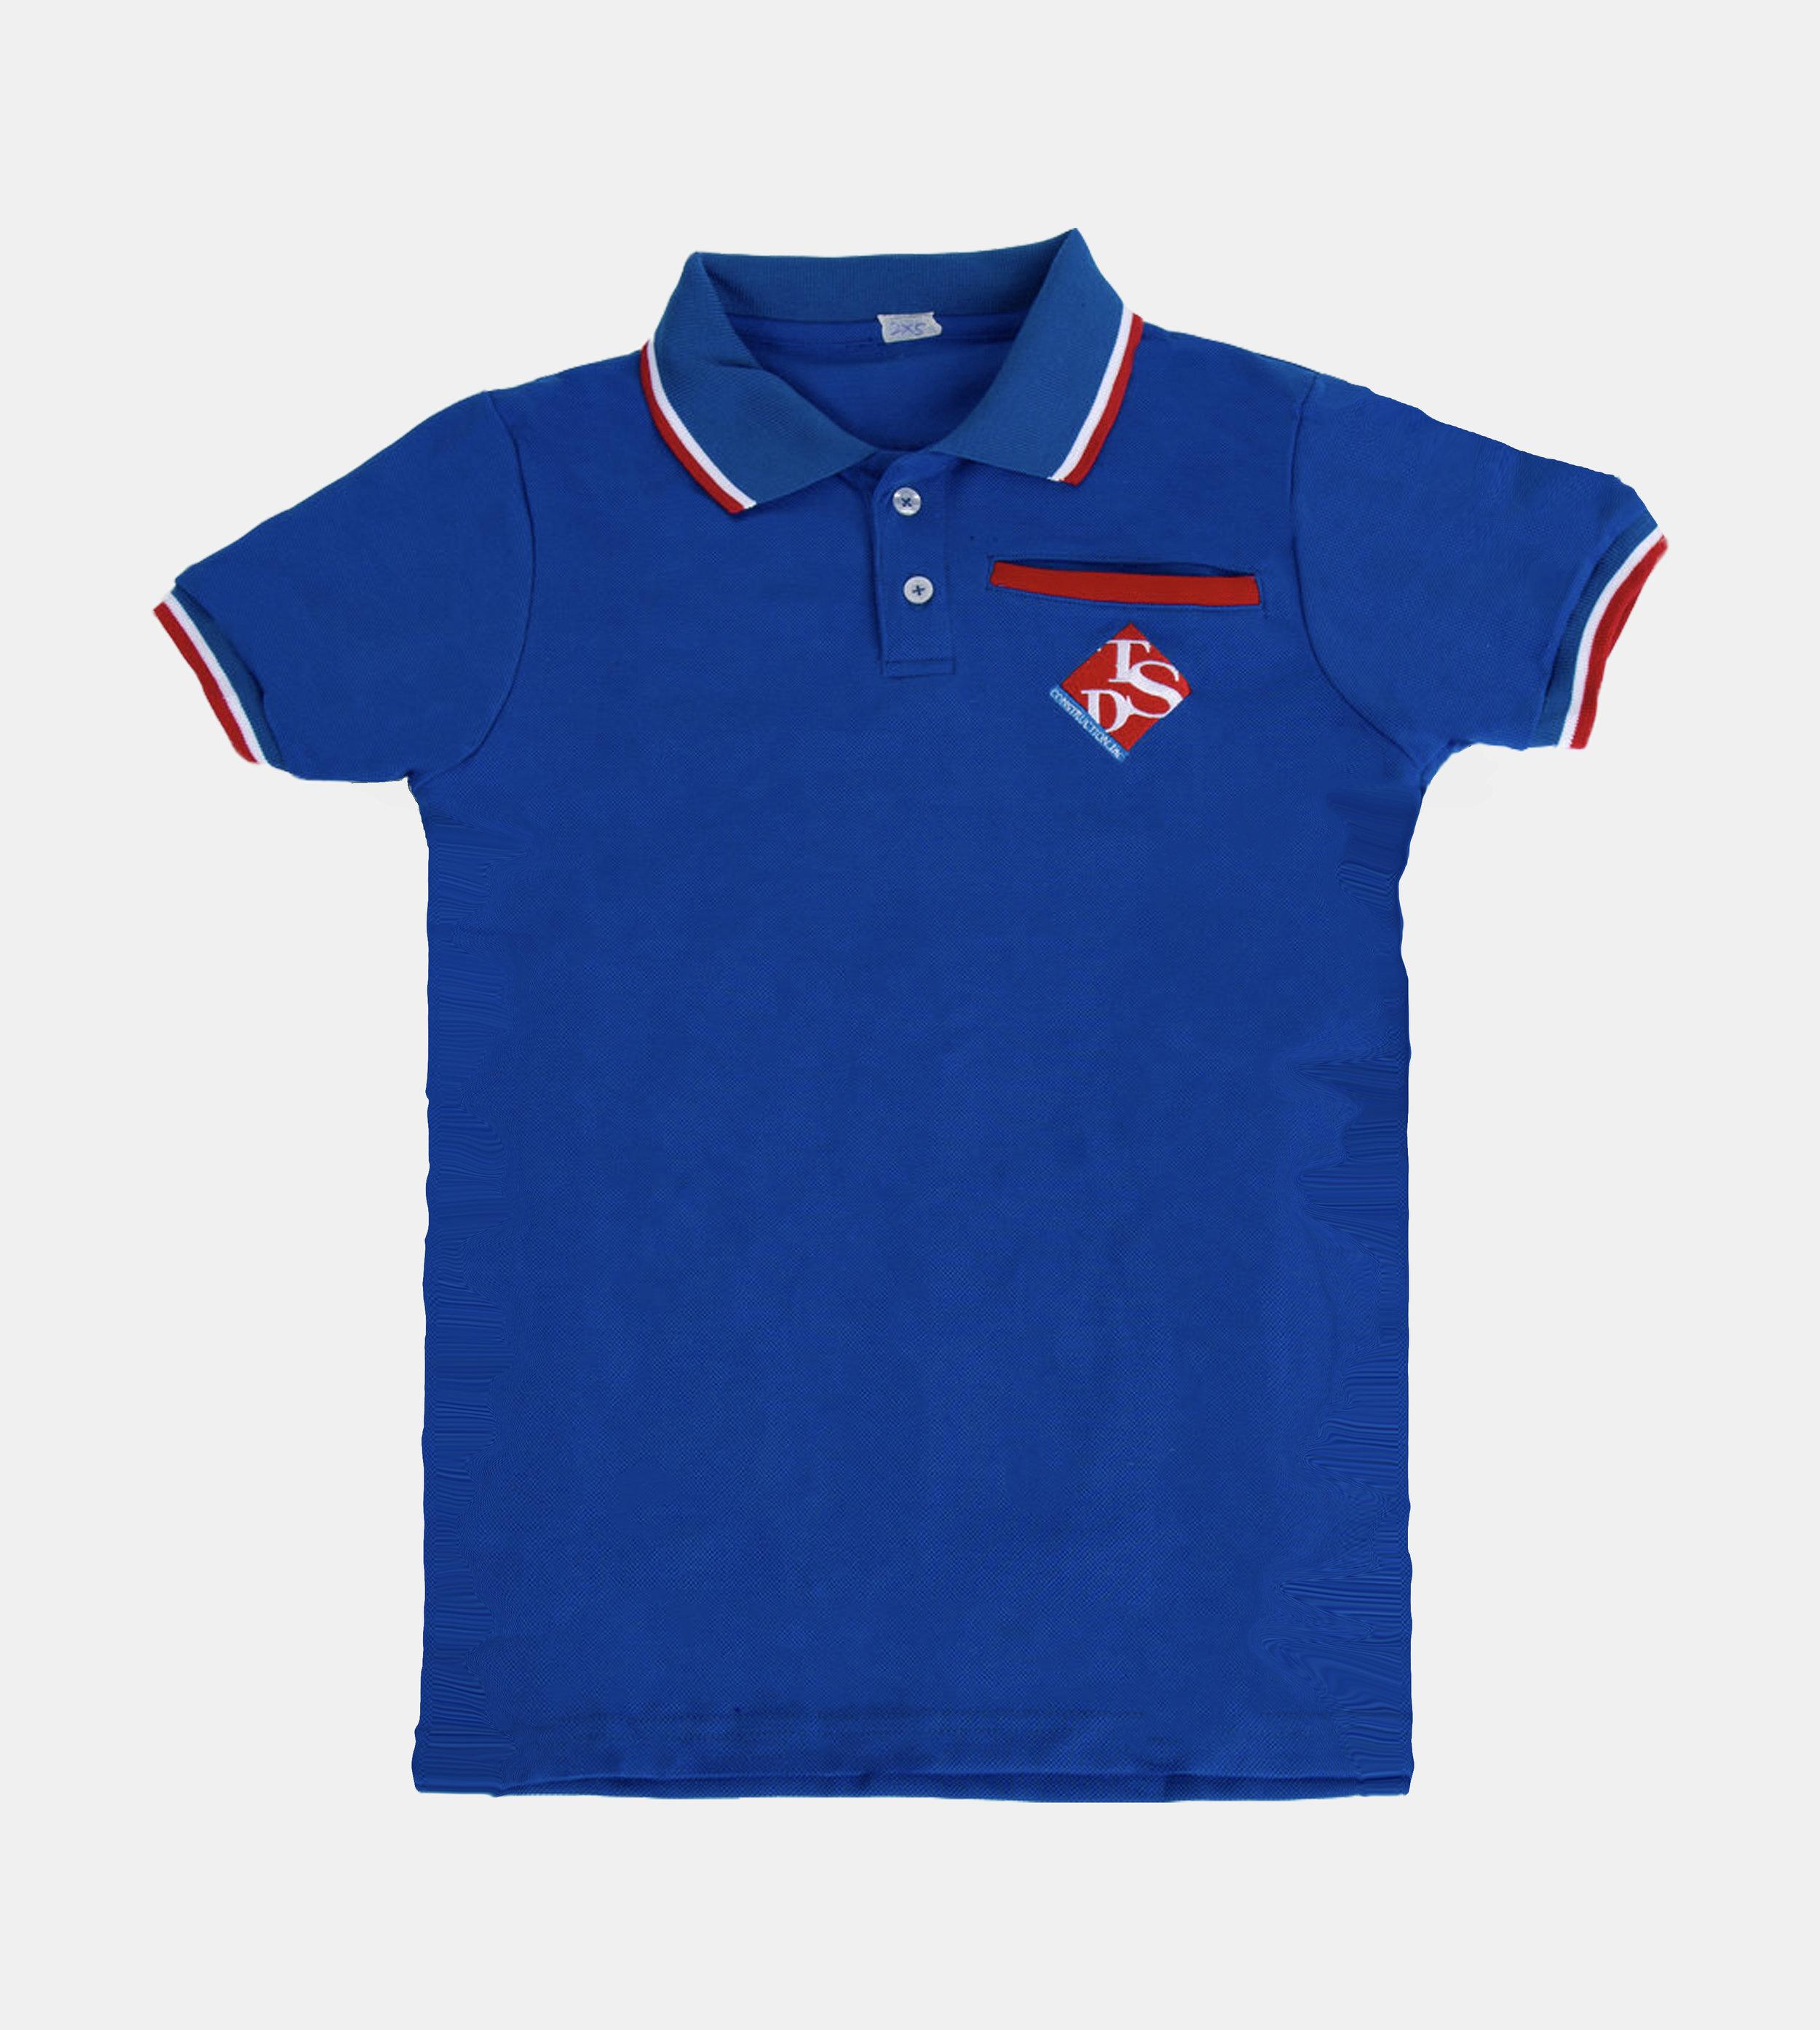 Tailored Projects-Custom Polo Shirt - TSD Construction.jpg